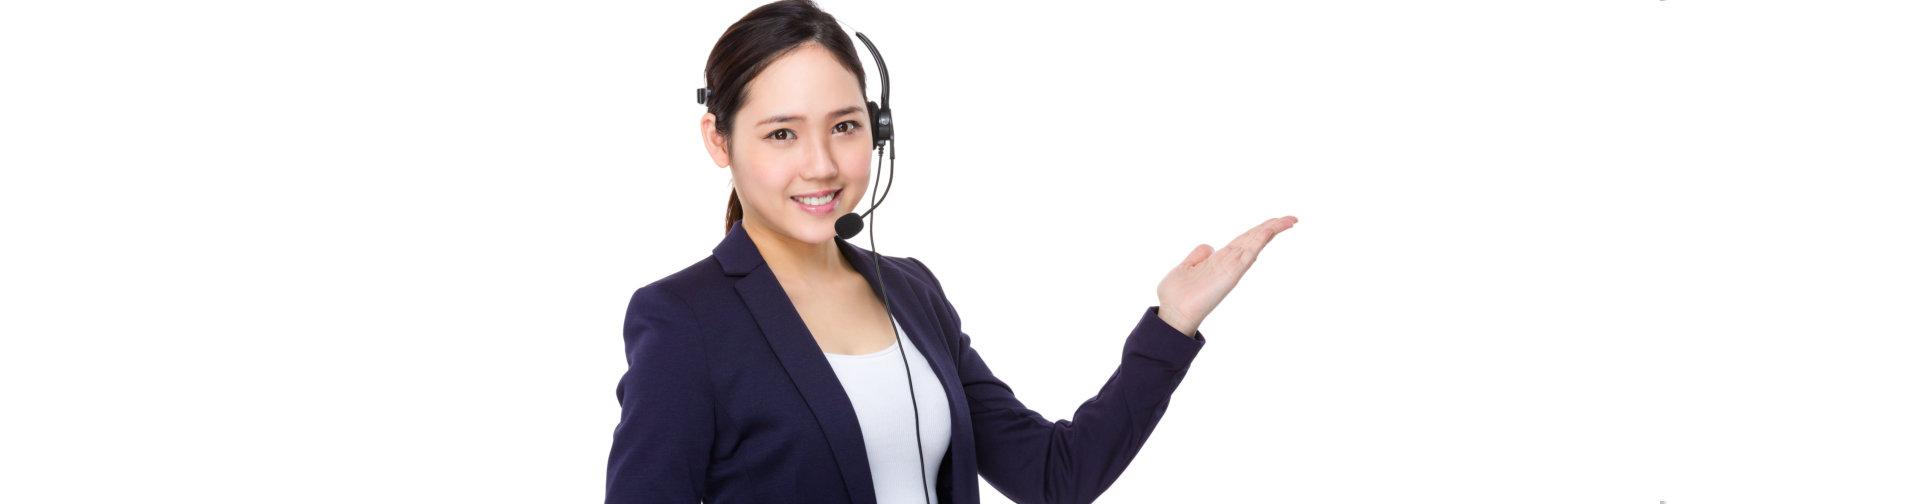 Call center agent with hand presentation